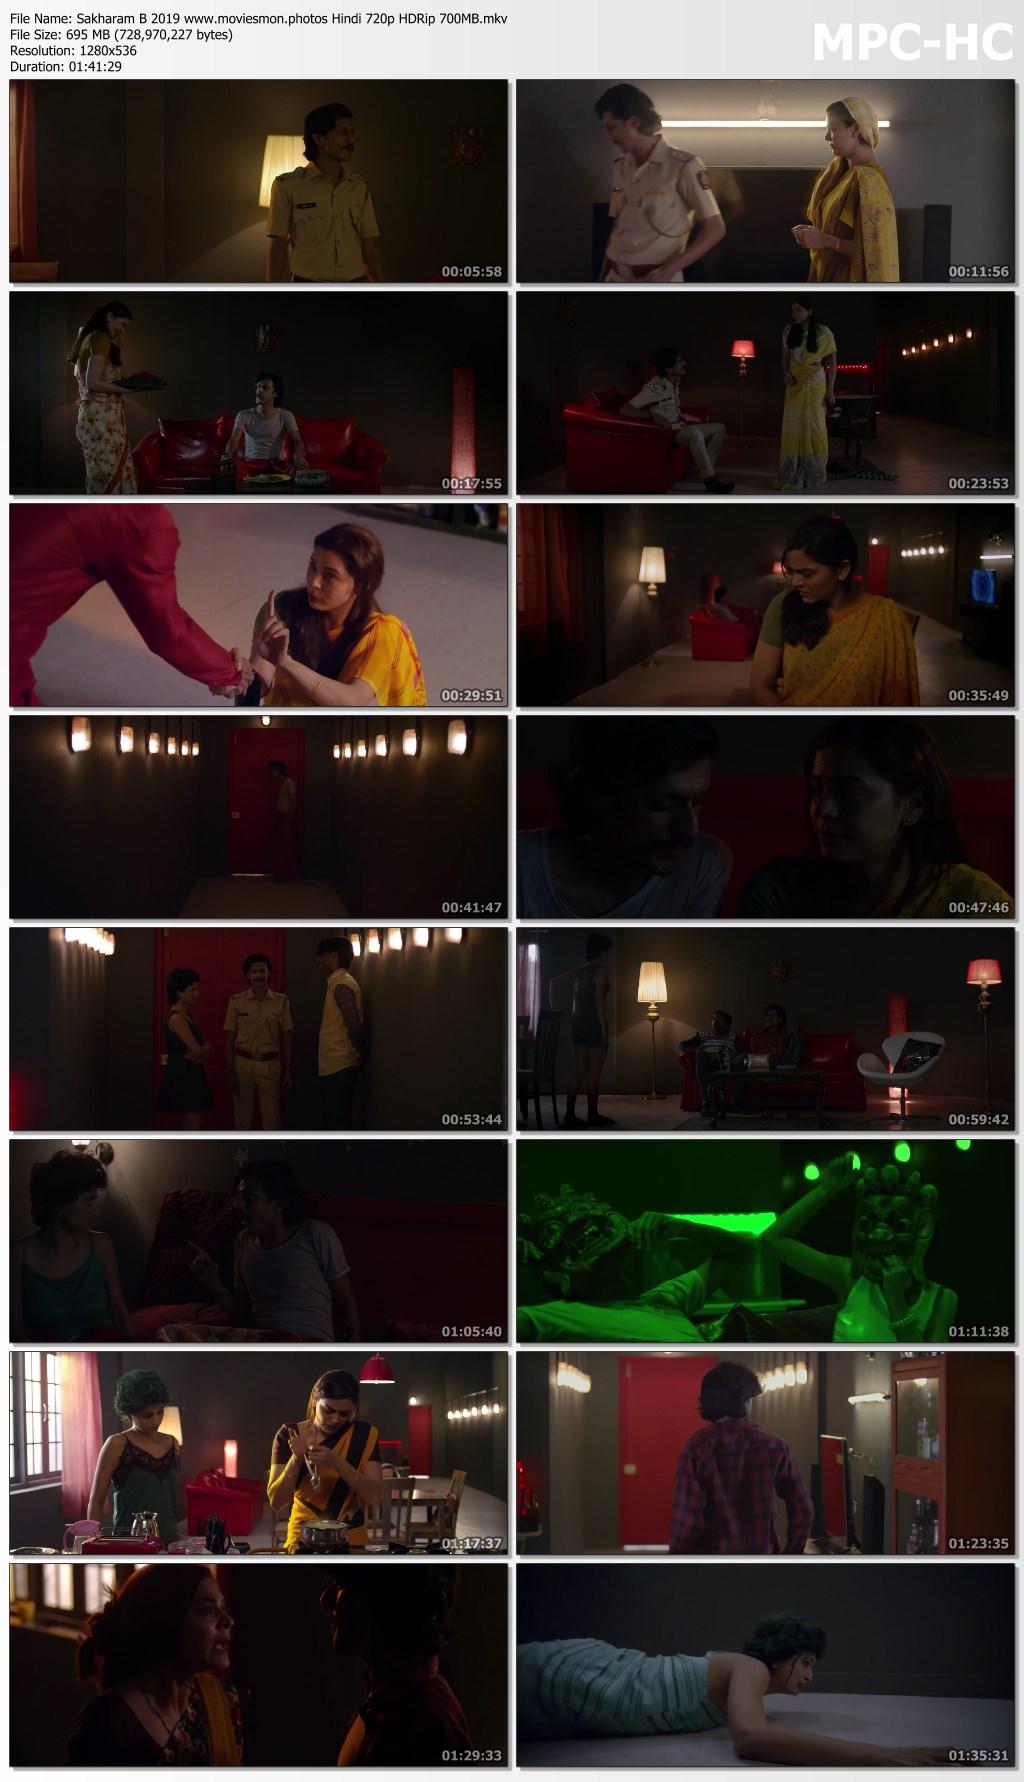 Sakharam B 2019 Hindi Full Movie 720p HDRip 690MB Download